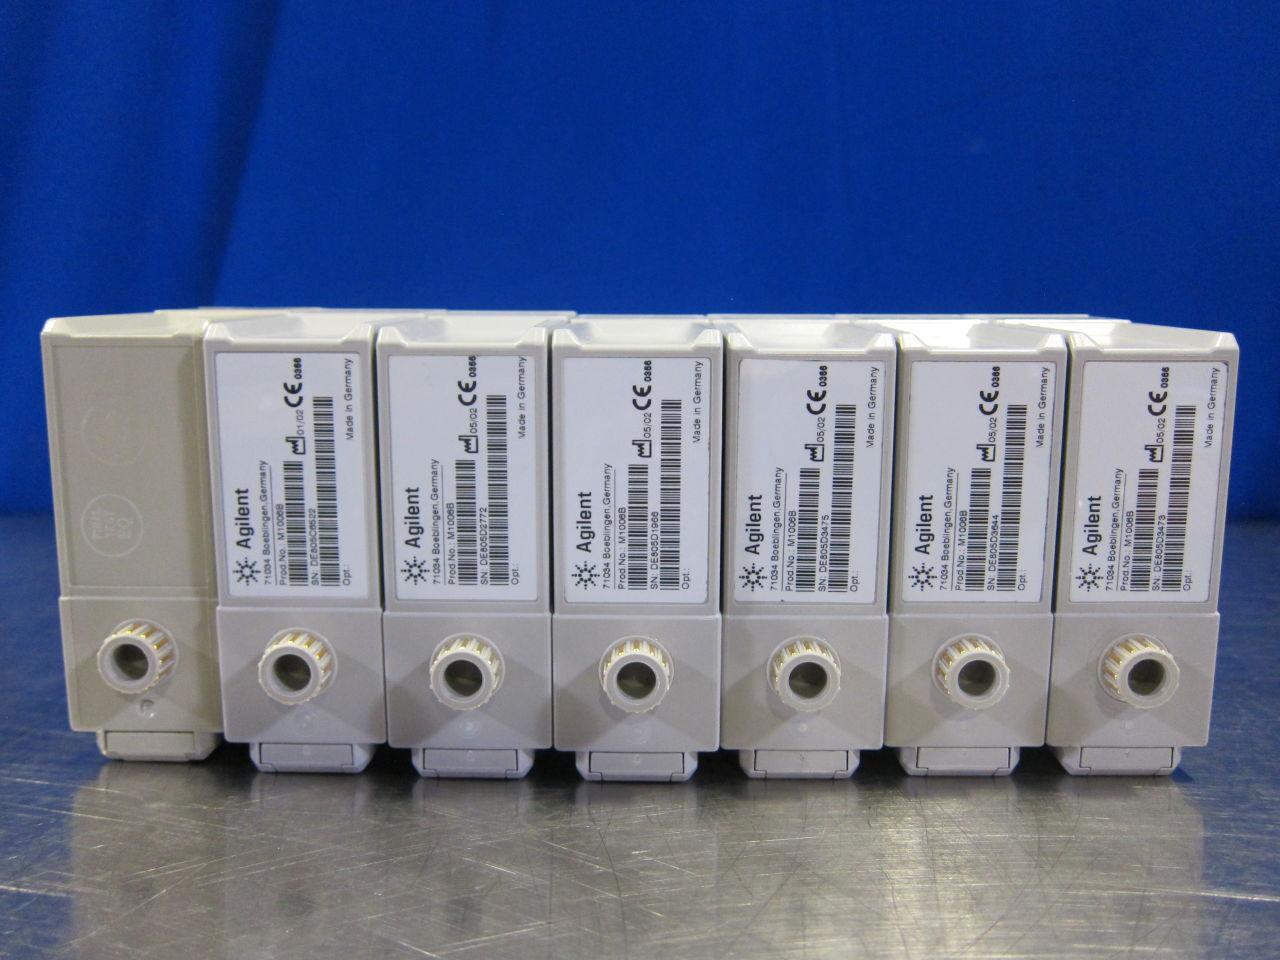 PHILIPS M1006B  - Lot of 15 Module